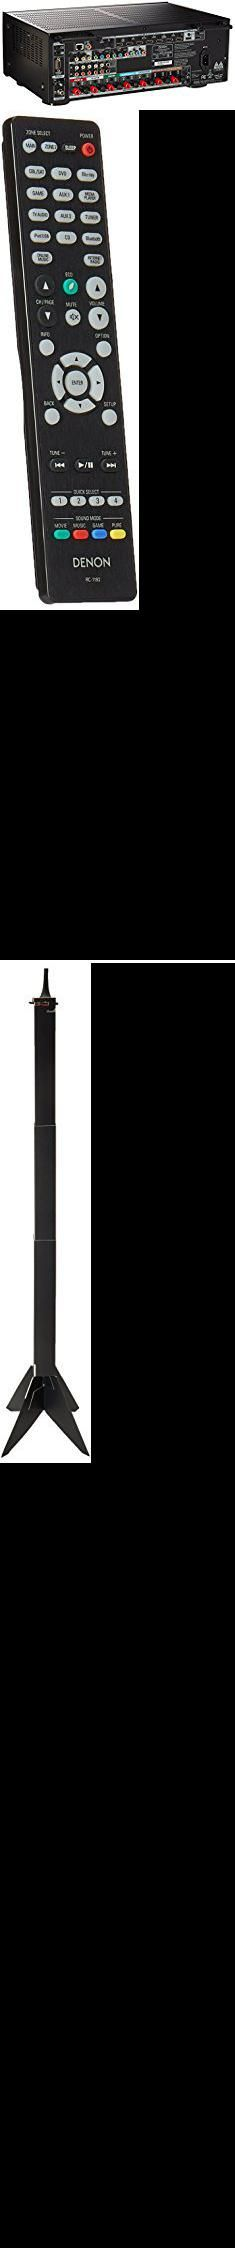 Denon X2300w. Denon AVR-X2300W 7.2 Channel Full 4K Ultra HD AV Receiver with Bluetooth.  #denon #x2300w #denonx2300w